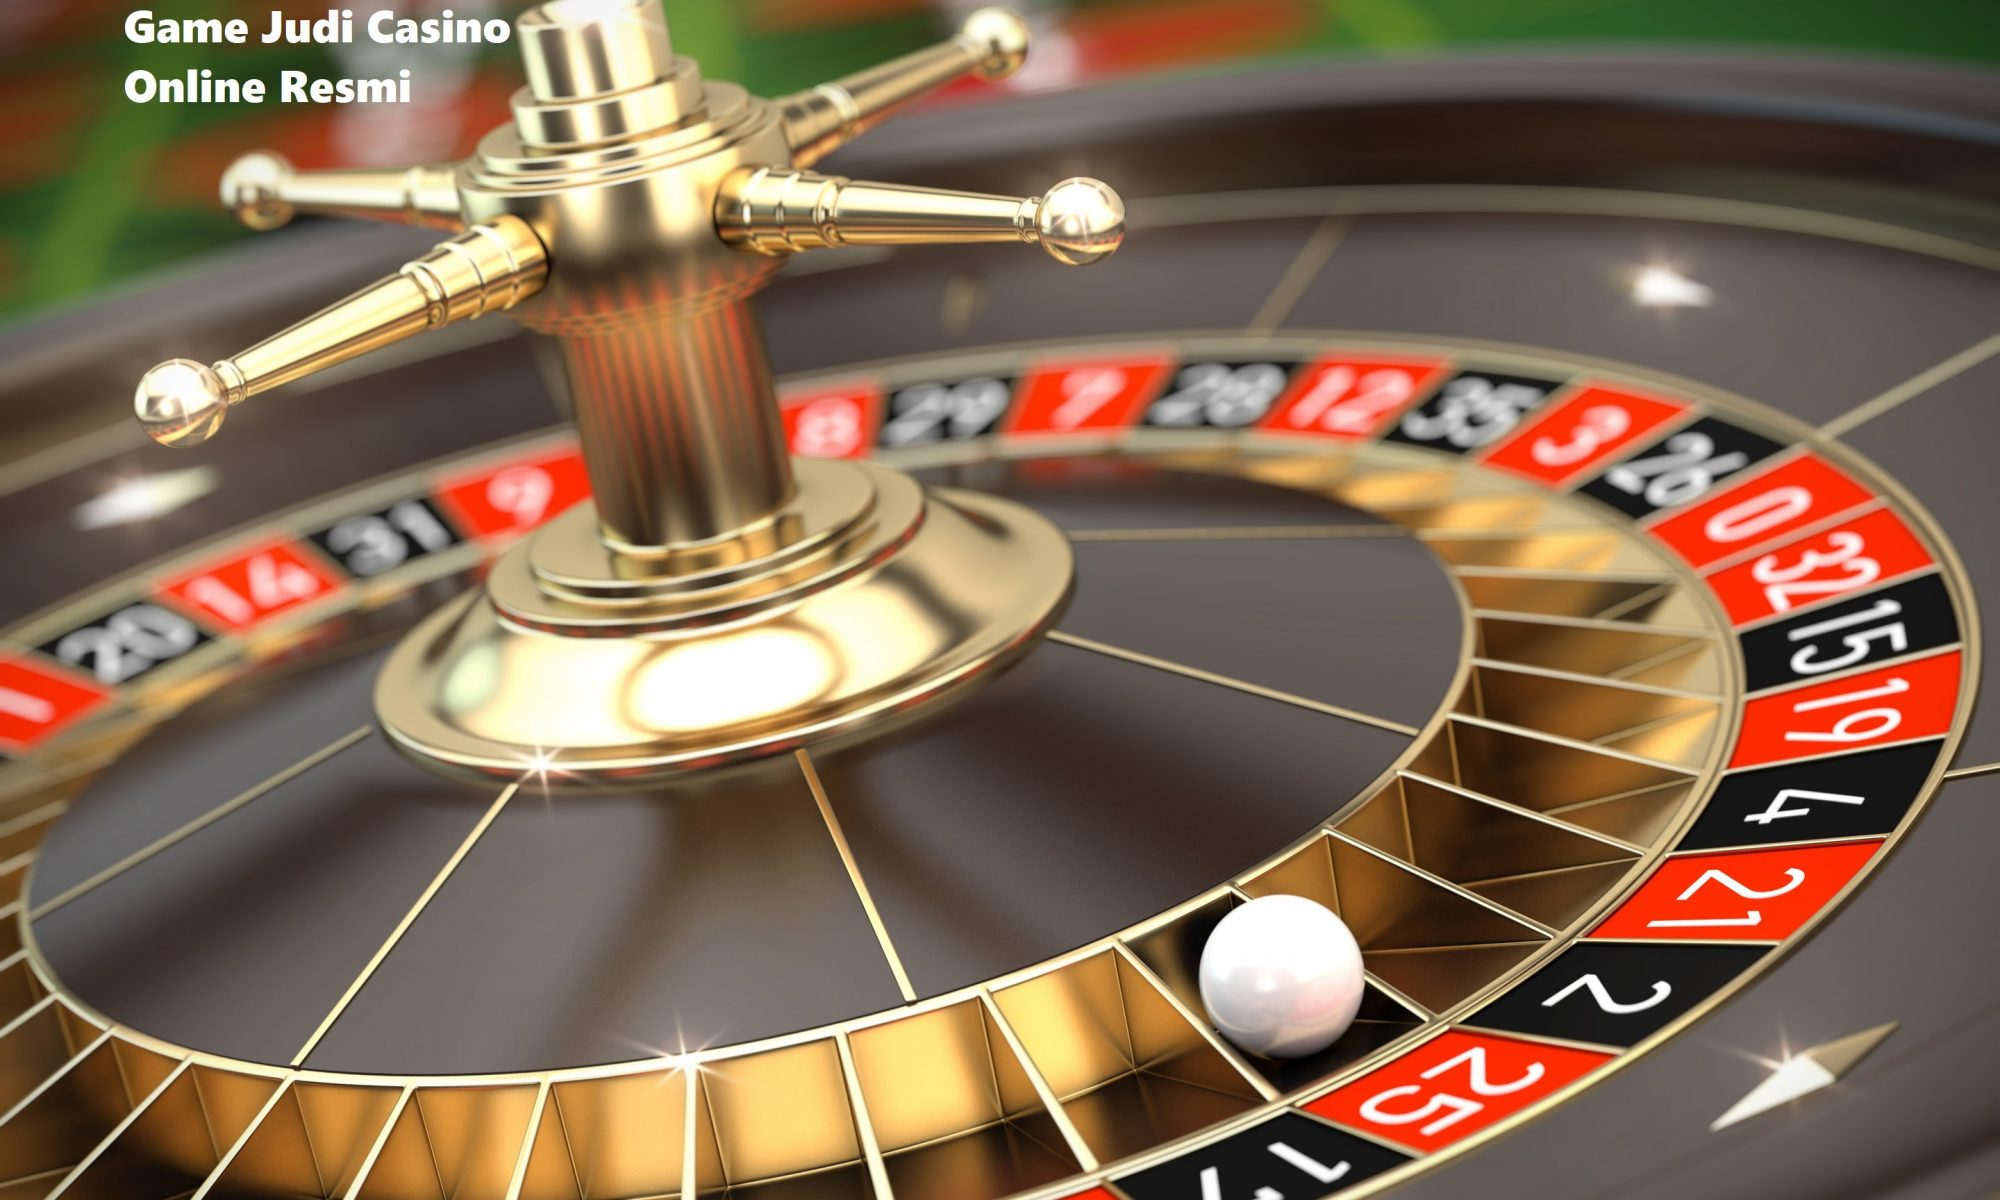 Game Judi Casino Online Resmi